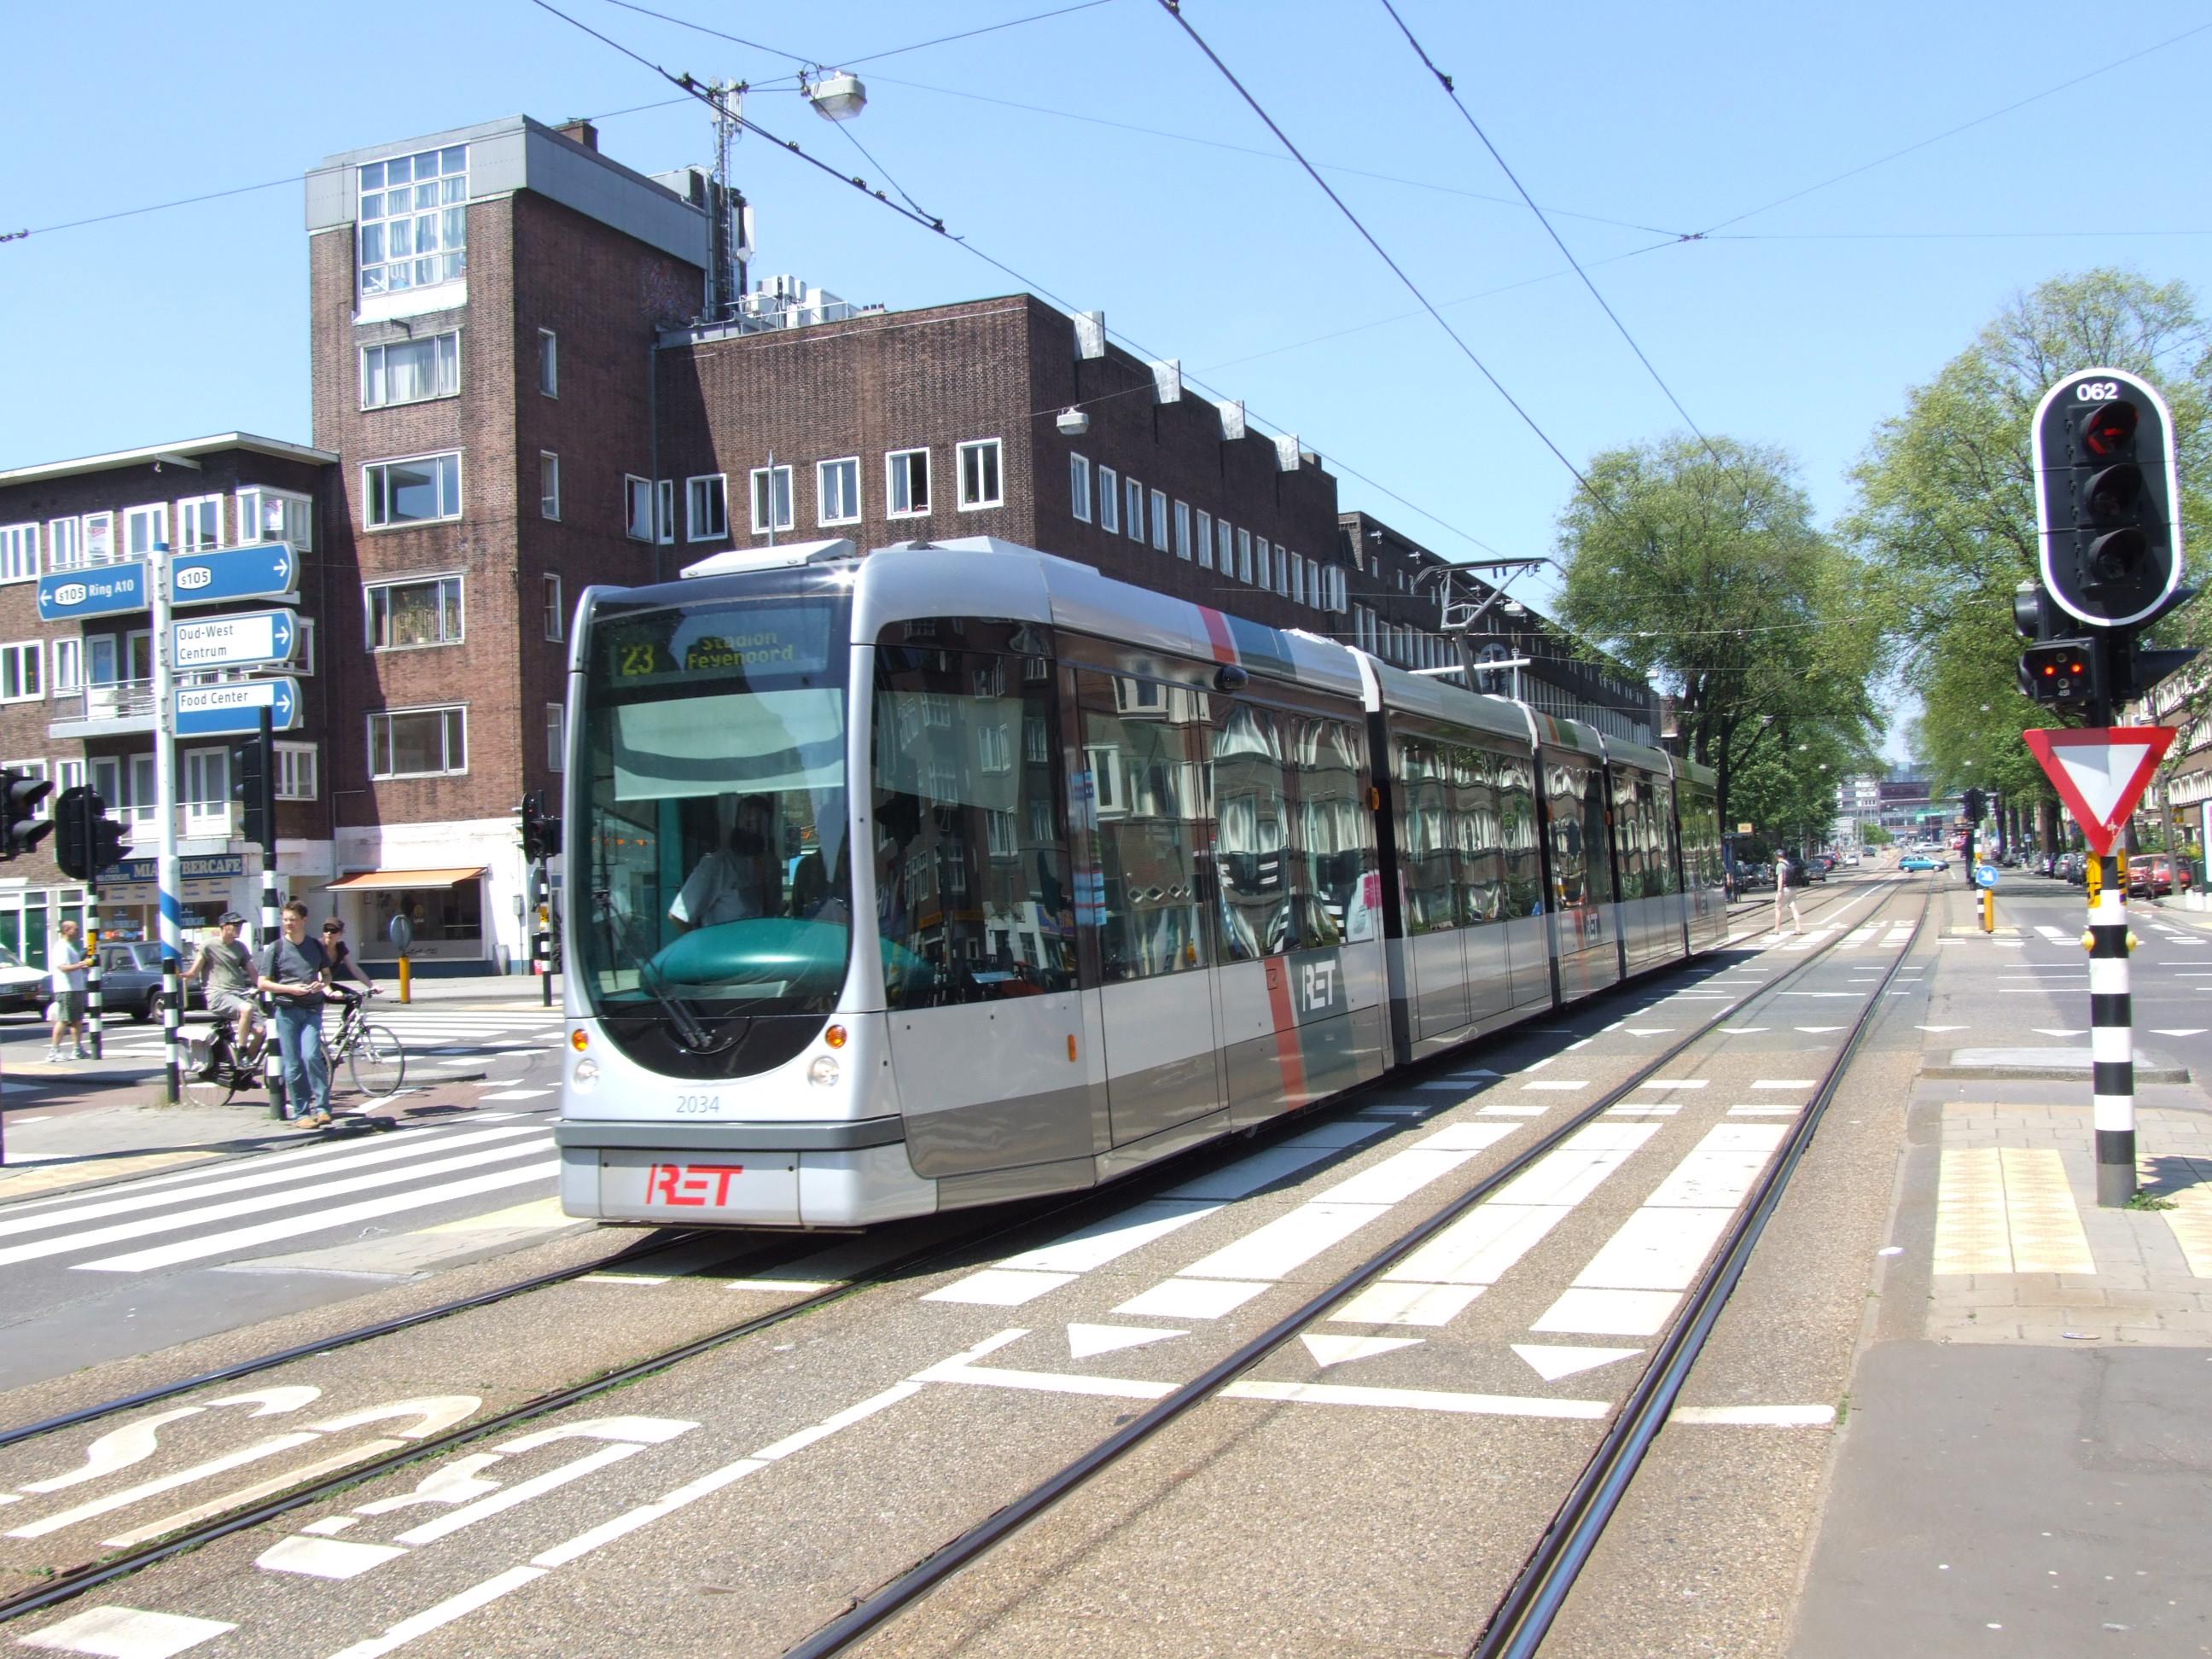 Brüssel Tram 5008.